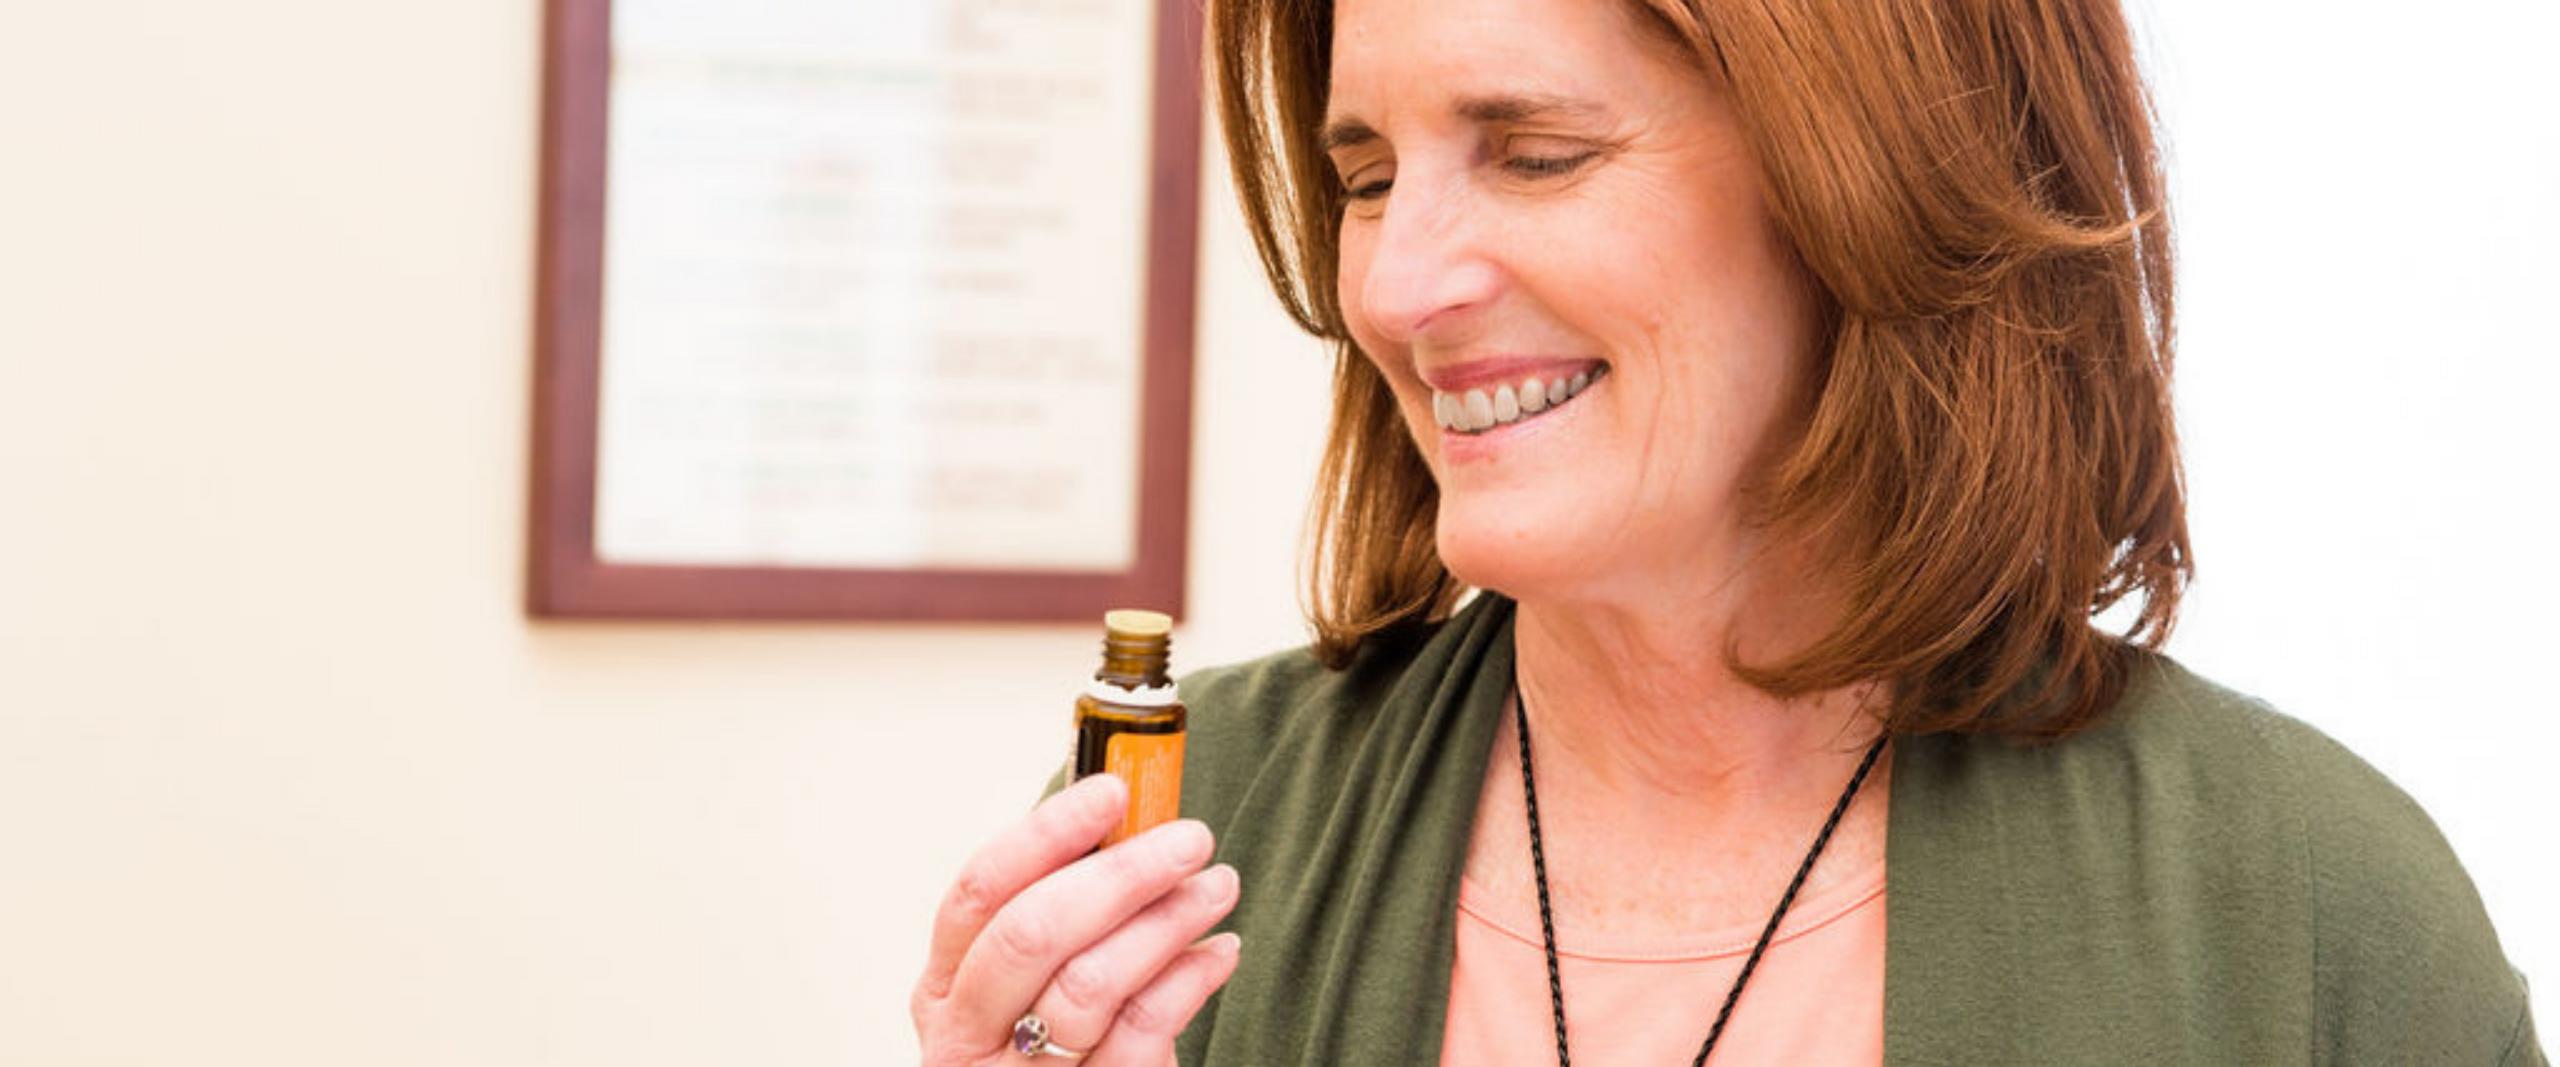 Debra Reis Wellness Services, LLC Clinical Nurse Specialist